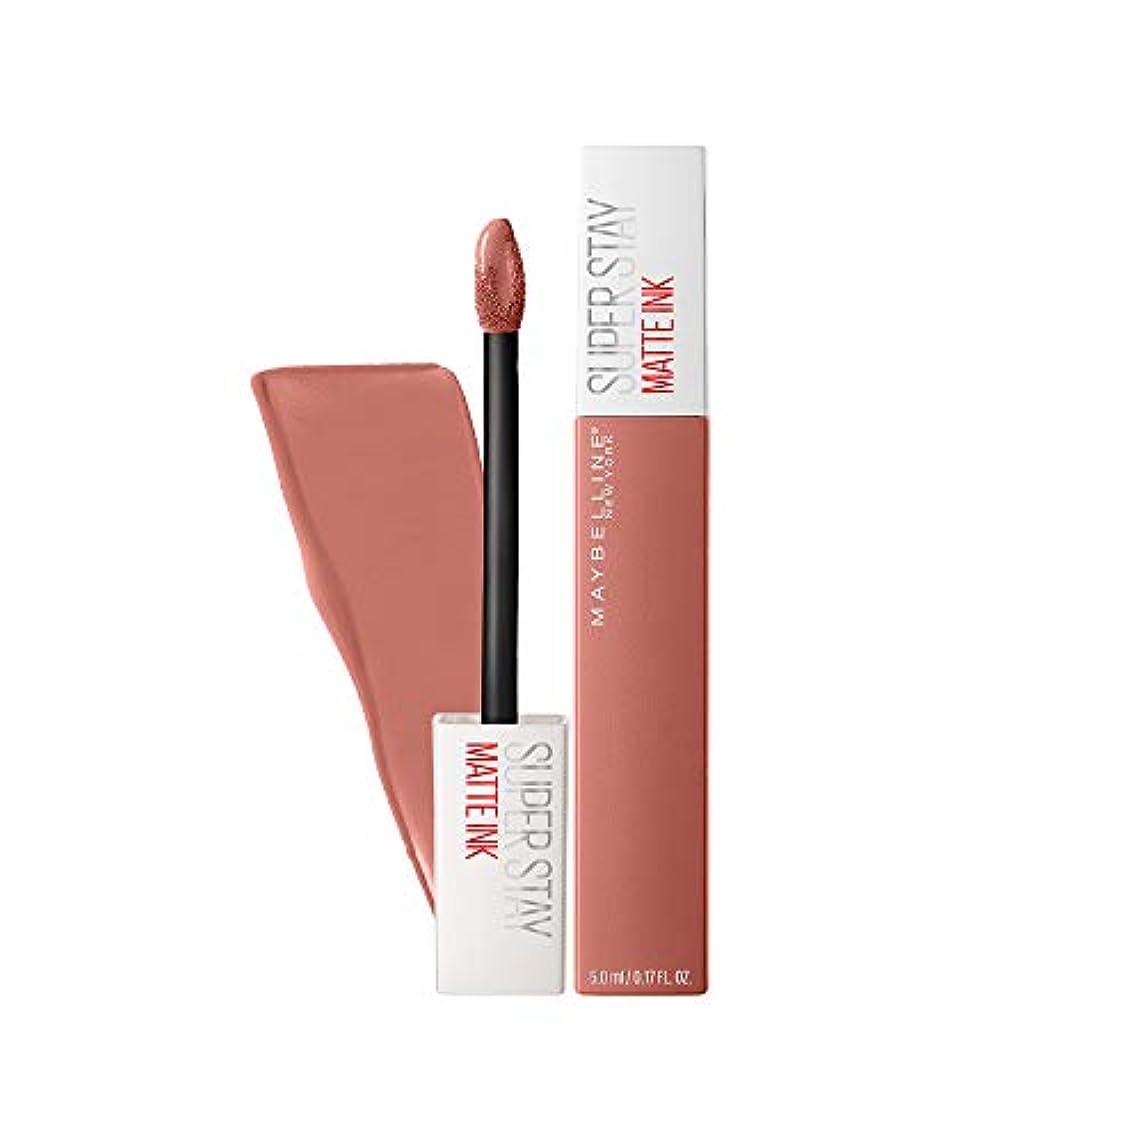 MAYBELLINE SuperStay Matte Ink - Seductress (並行輸入品)